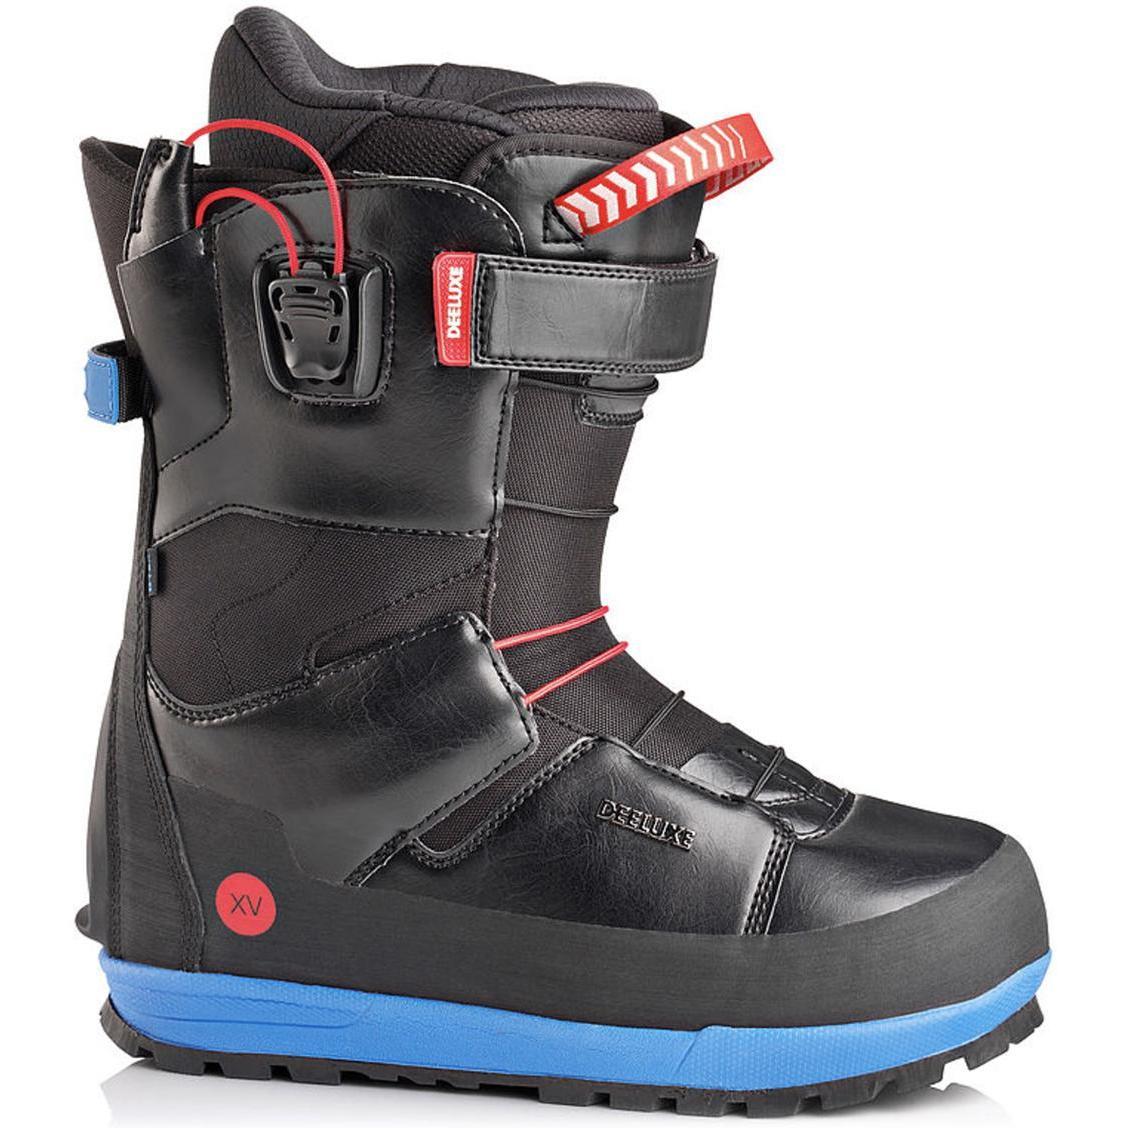 Ботинки для сноуборда DEELUXE 2018-19 Spark XV TF black - купить ... 2540ec108d5